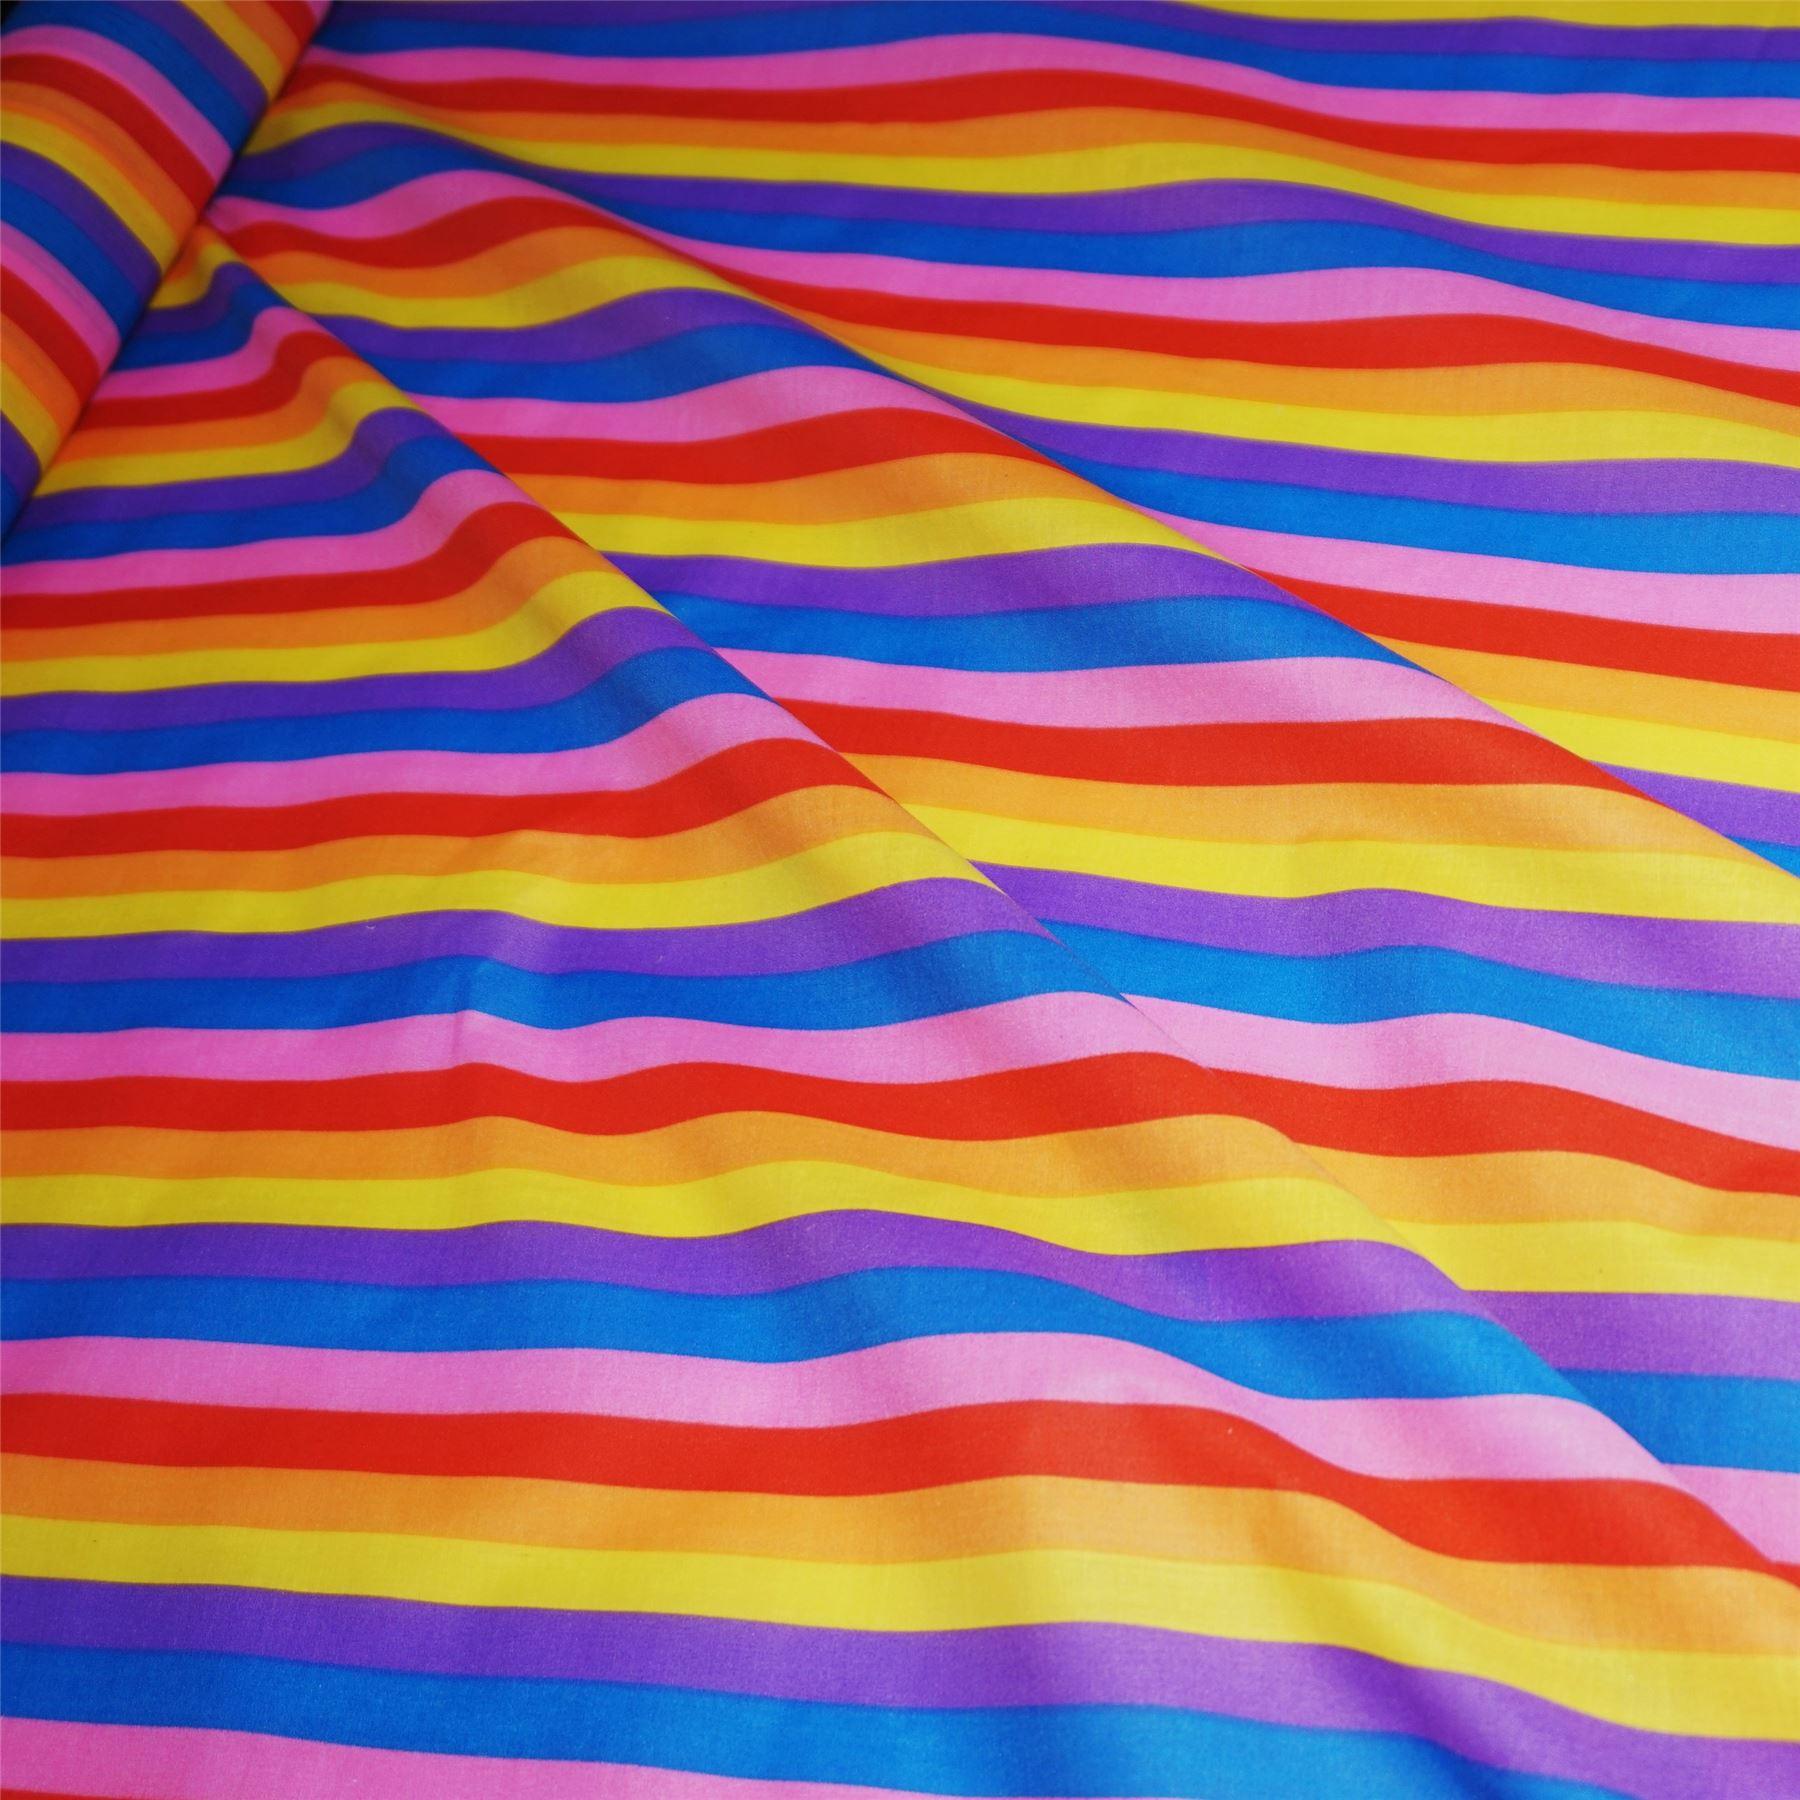 Carnival Rainbow 15mm Stripe Polycotton Fabric - 2 Colourways (Per Metre)